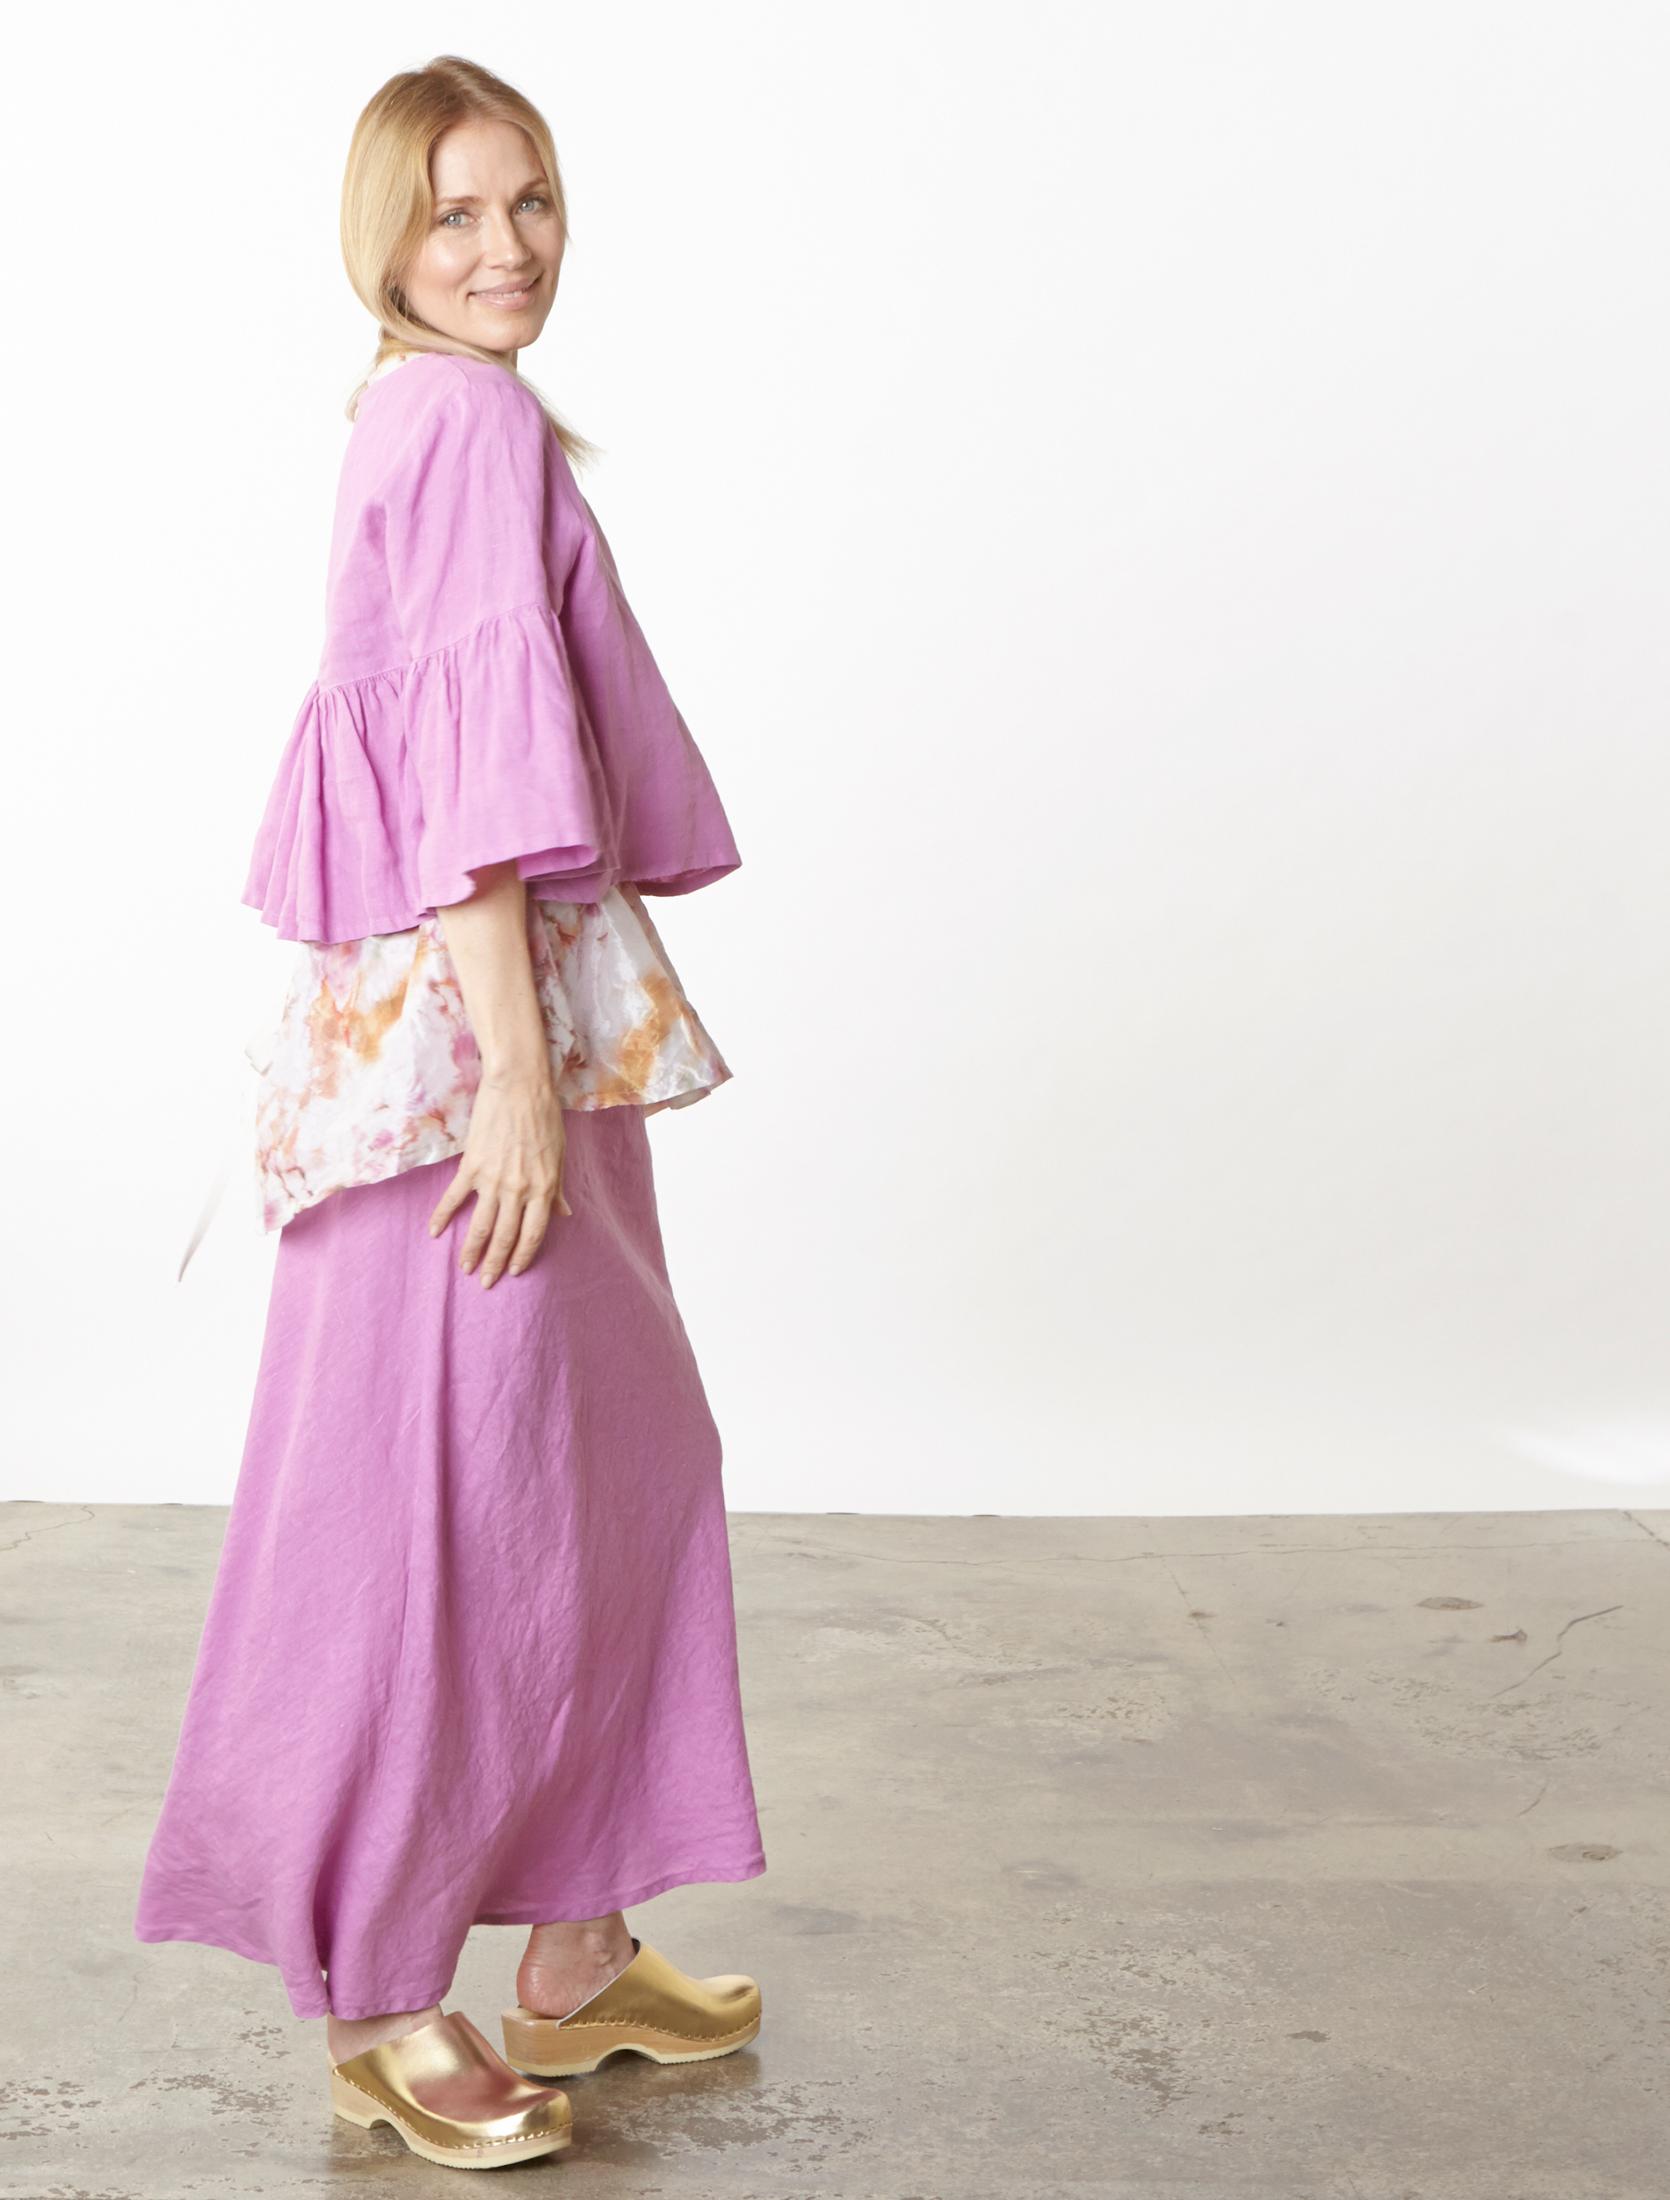 Frida Shirt, Long Bias Skirt in lxia Light Linen, Lois Tank in Versailles Italian Memory Crunch Taffeta